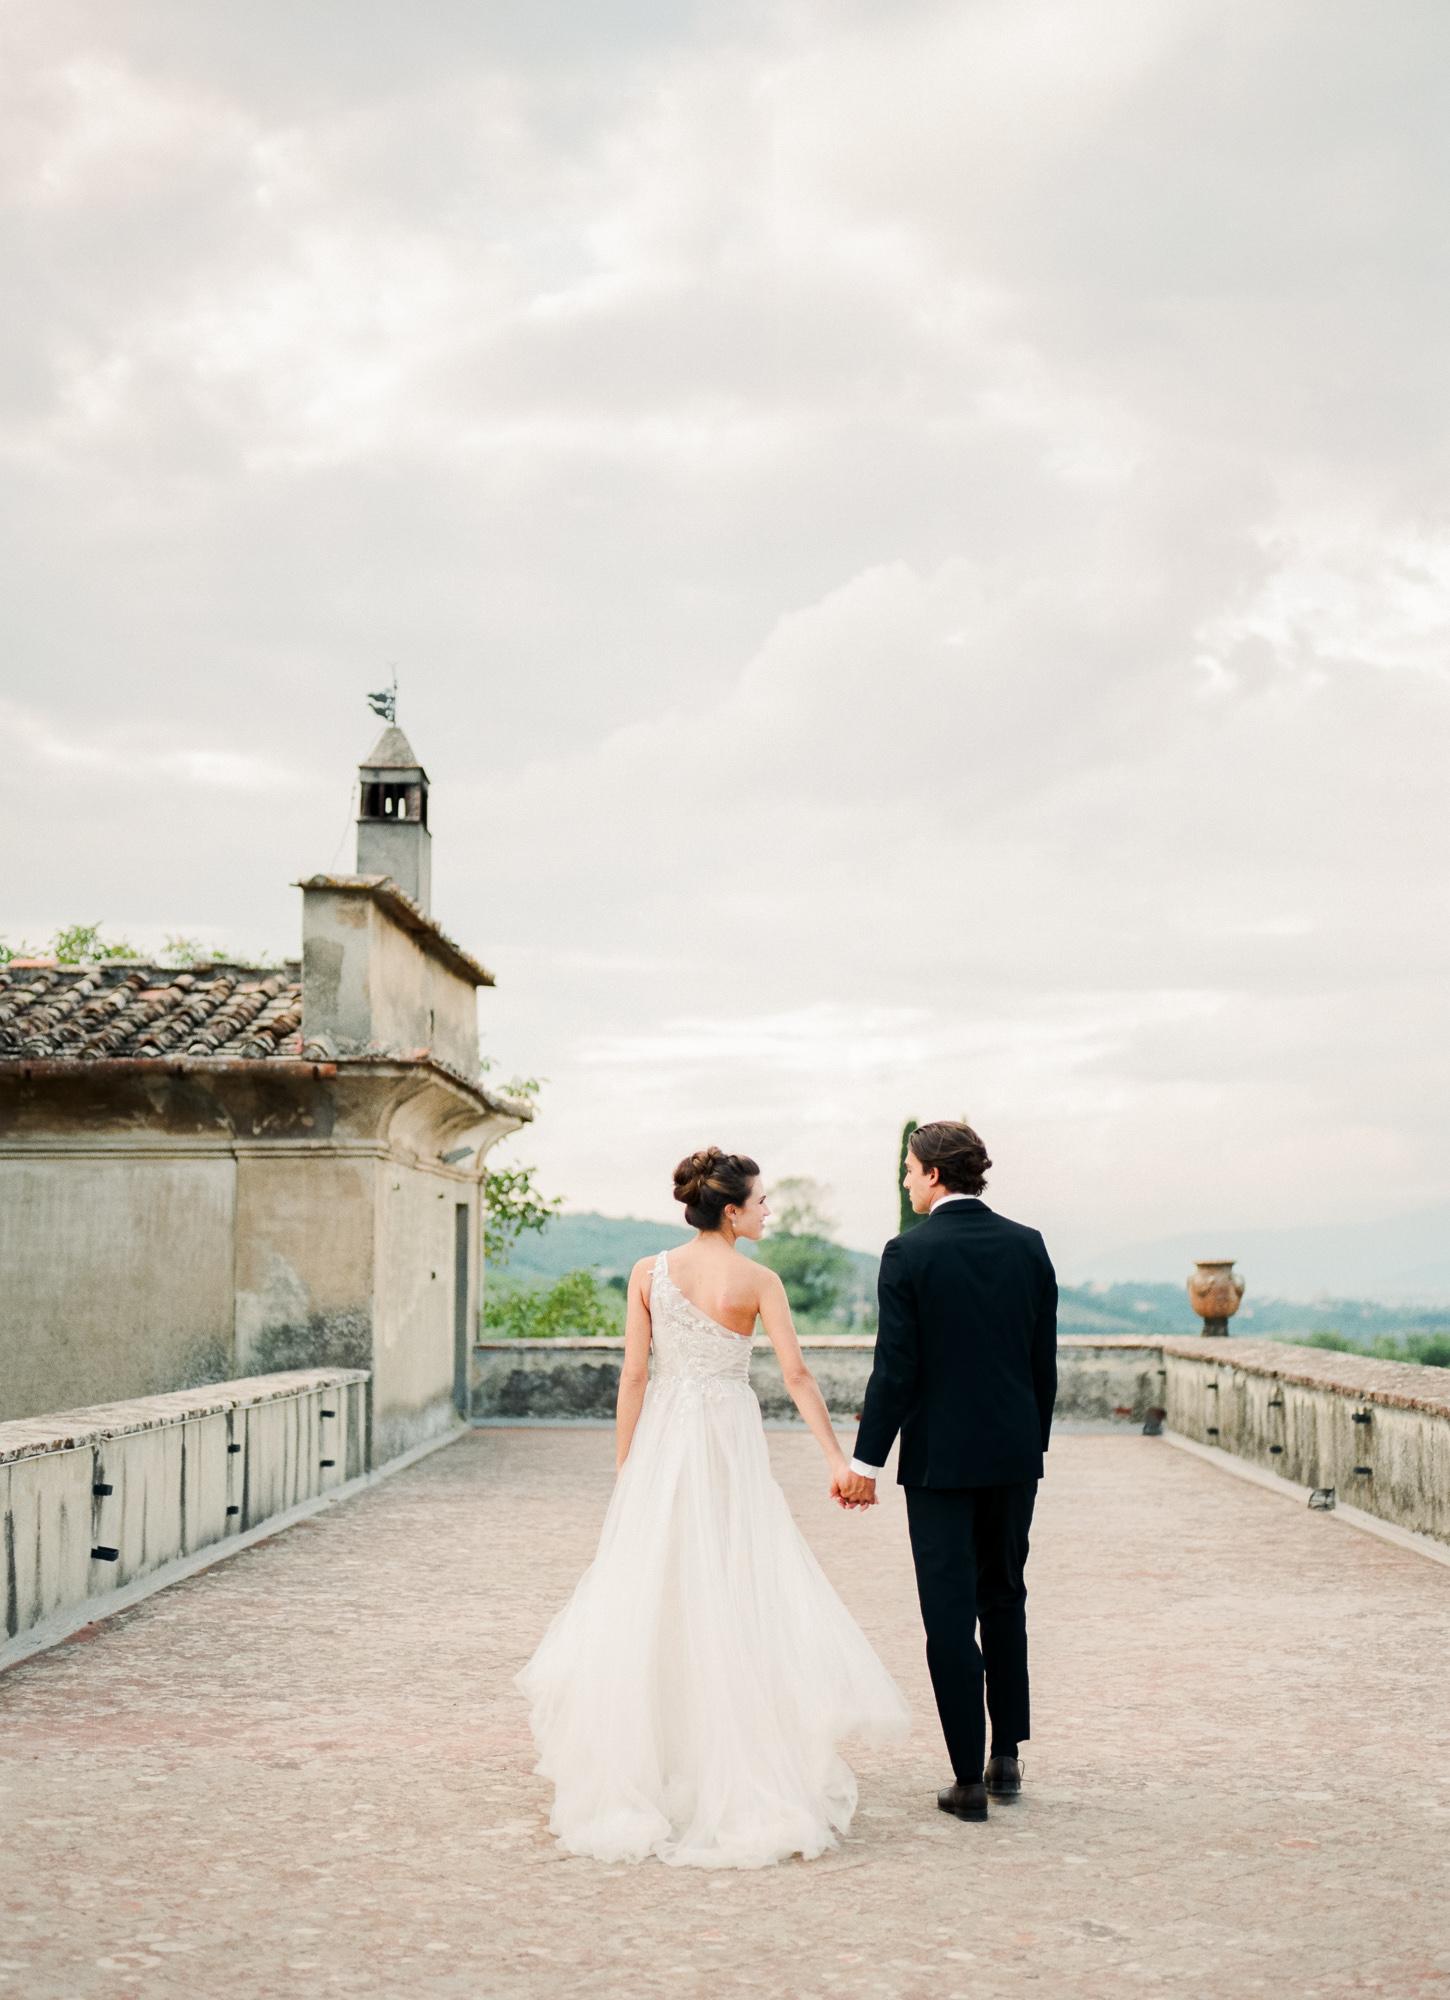 Medici Villa - Olga Makarova Photography